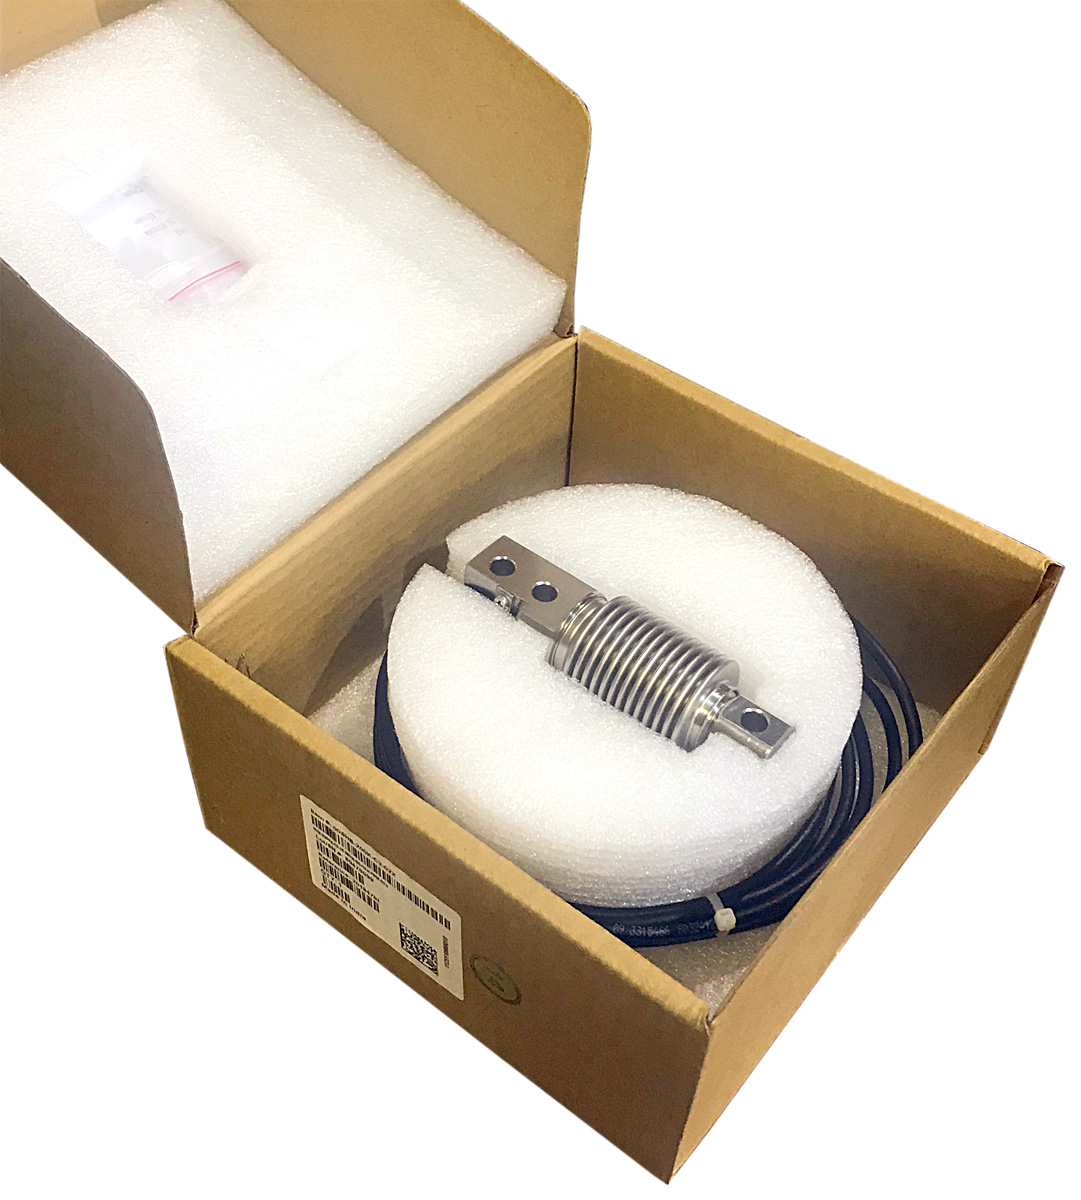 Тензодатчик Revere SHB в упаковке